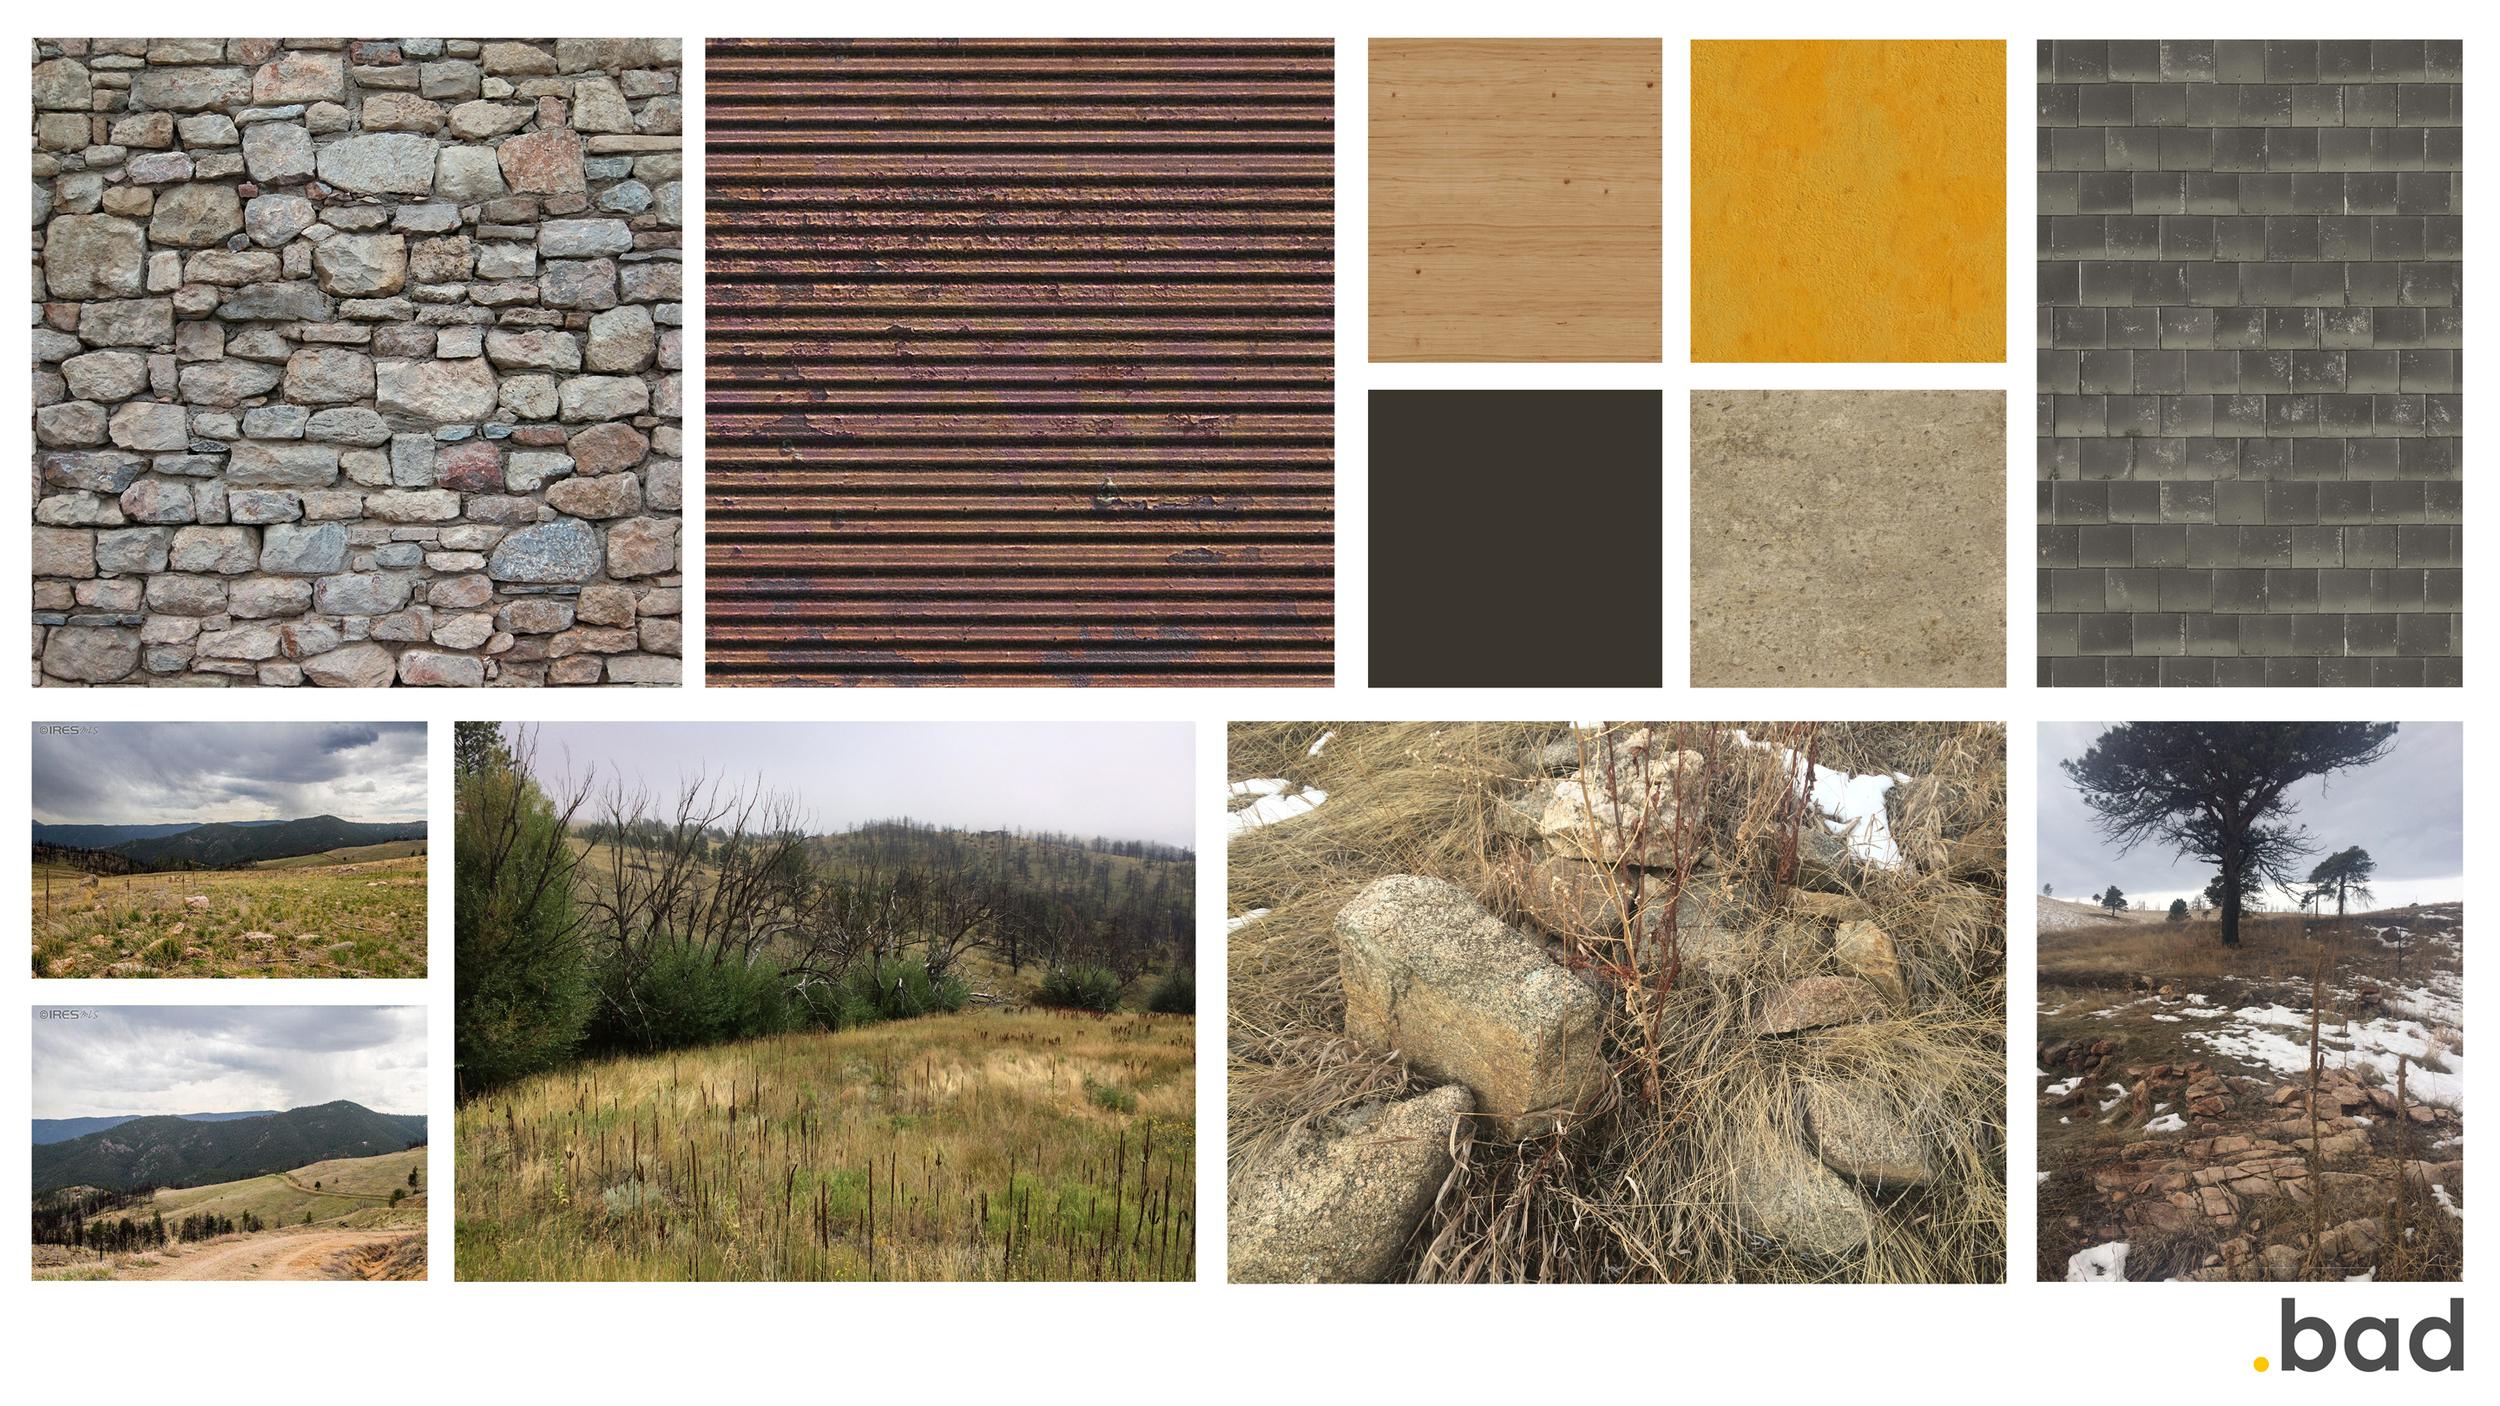 09 - Rocky Mountain - Materials - Exterior copy.jpg